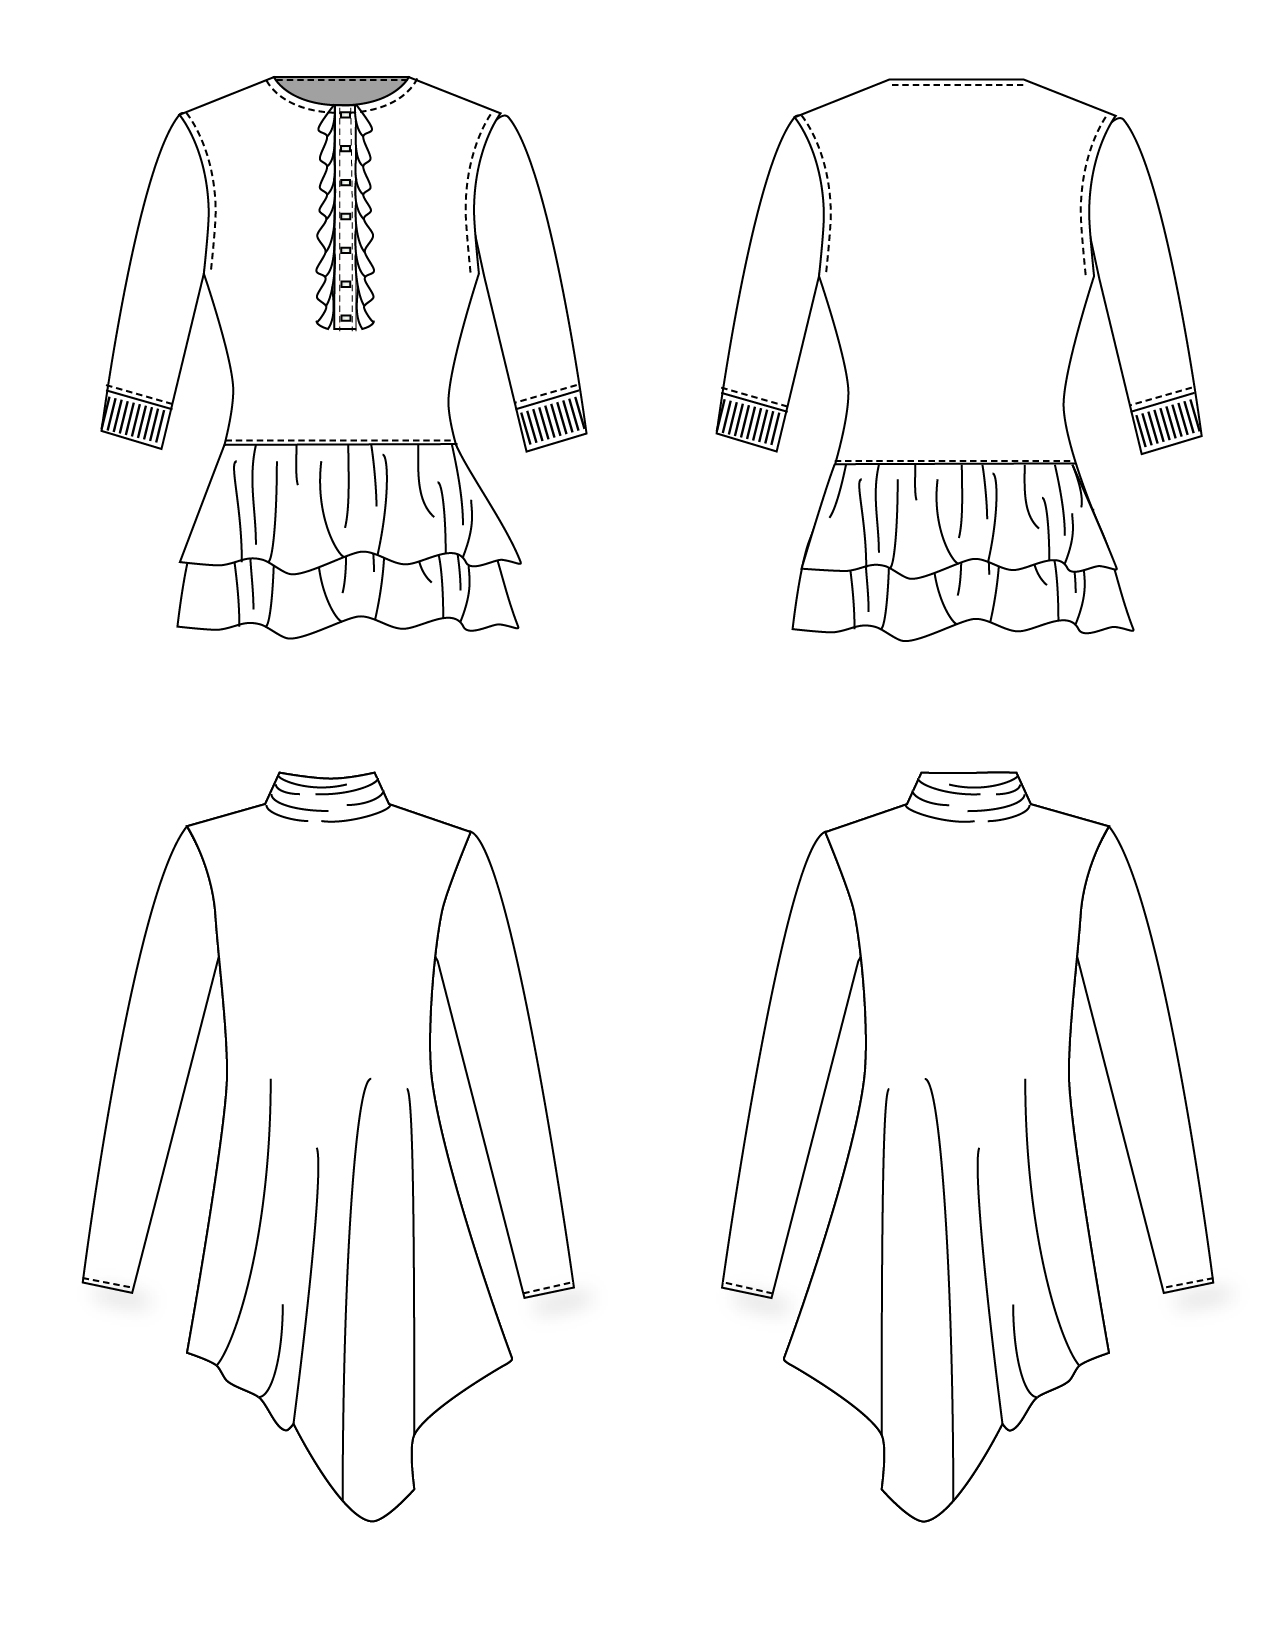 fashion-illustrations-16.jpg